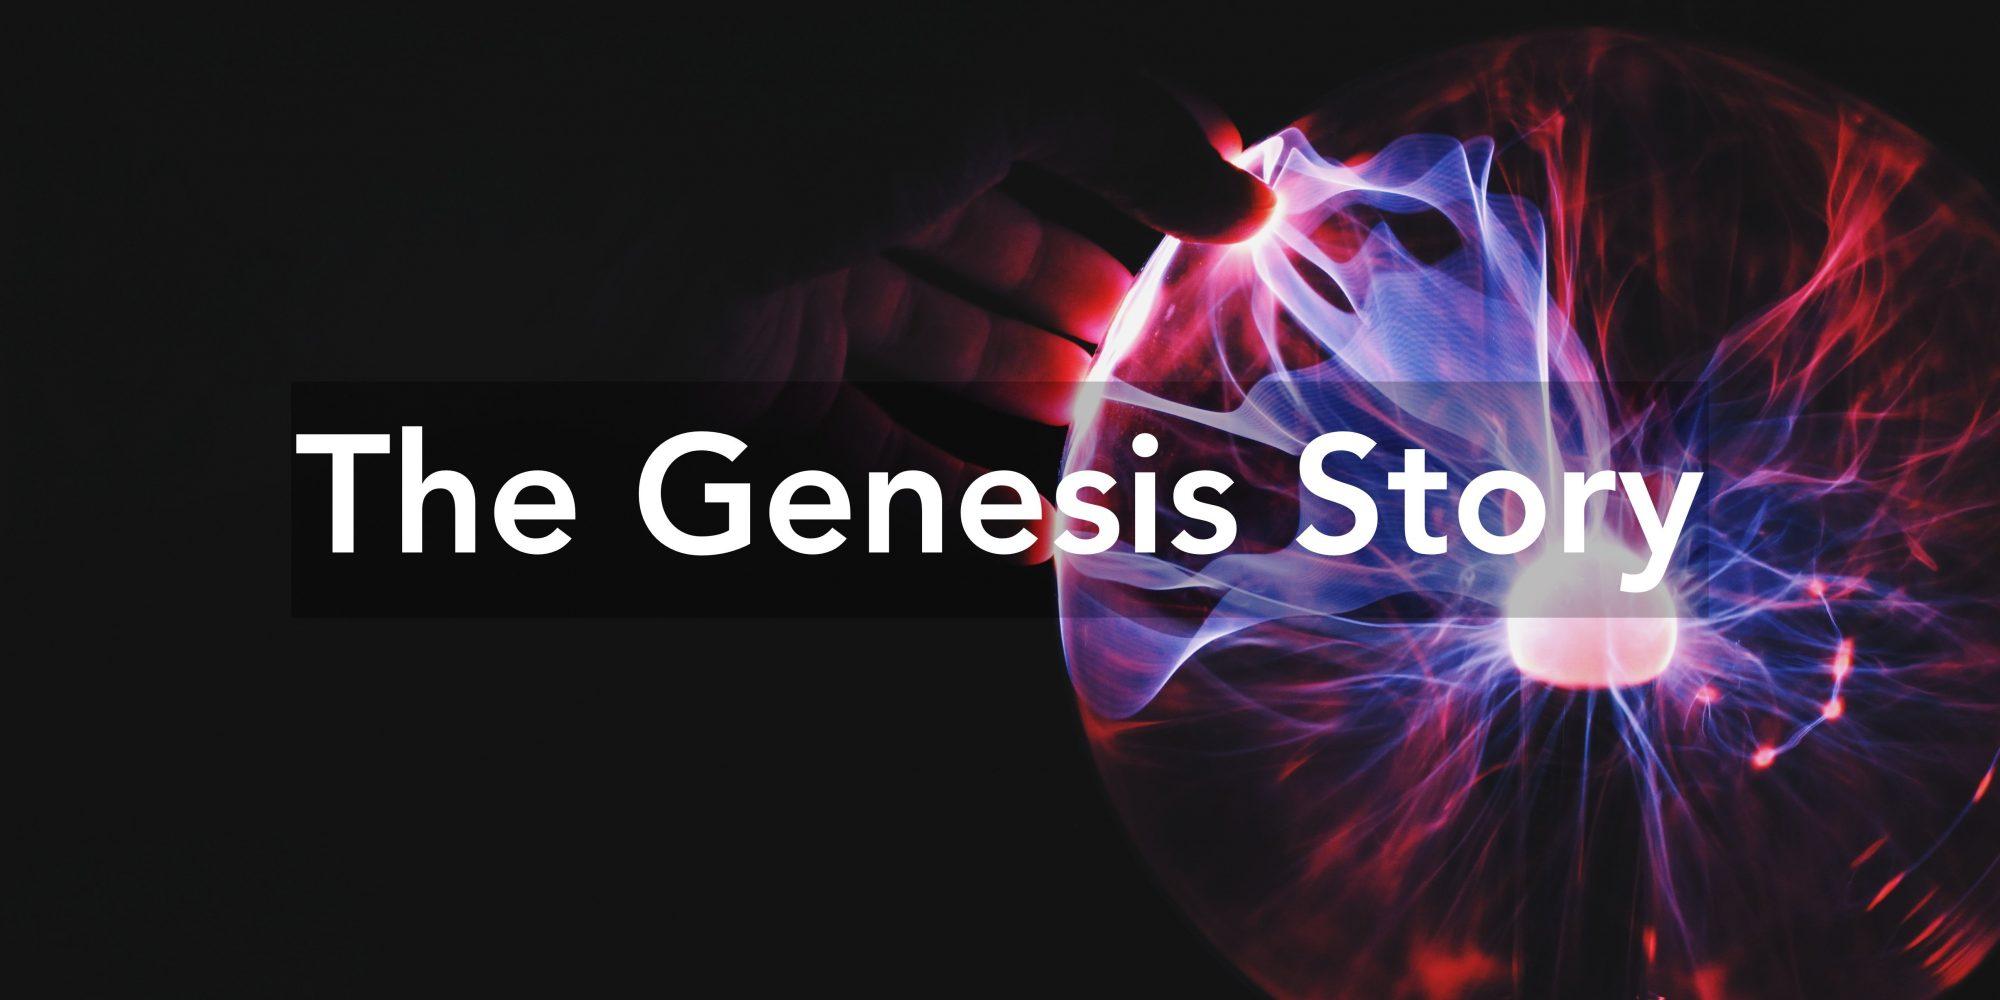 The Genesis Story